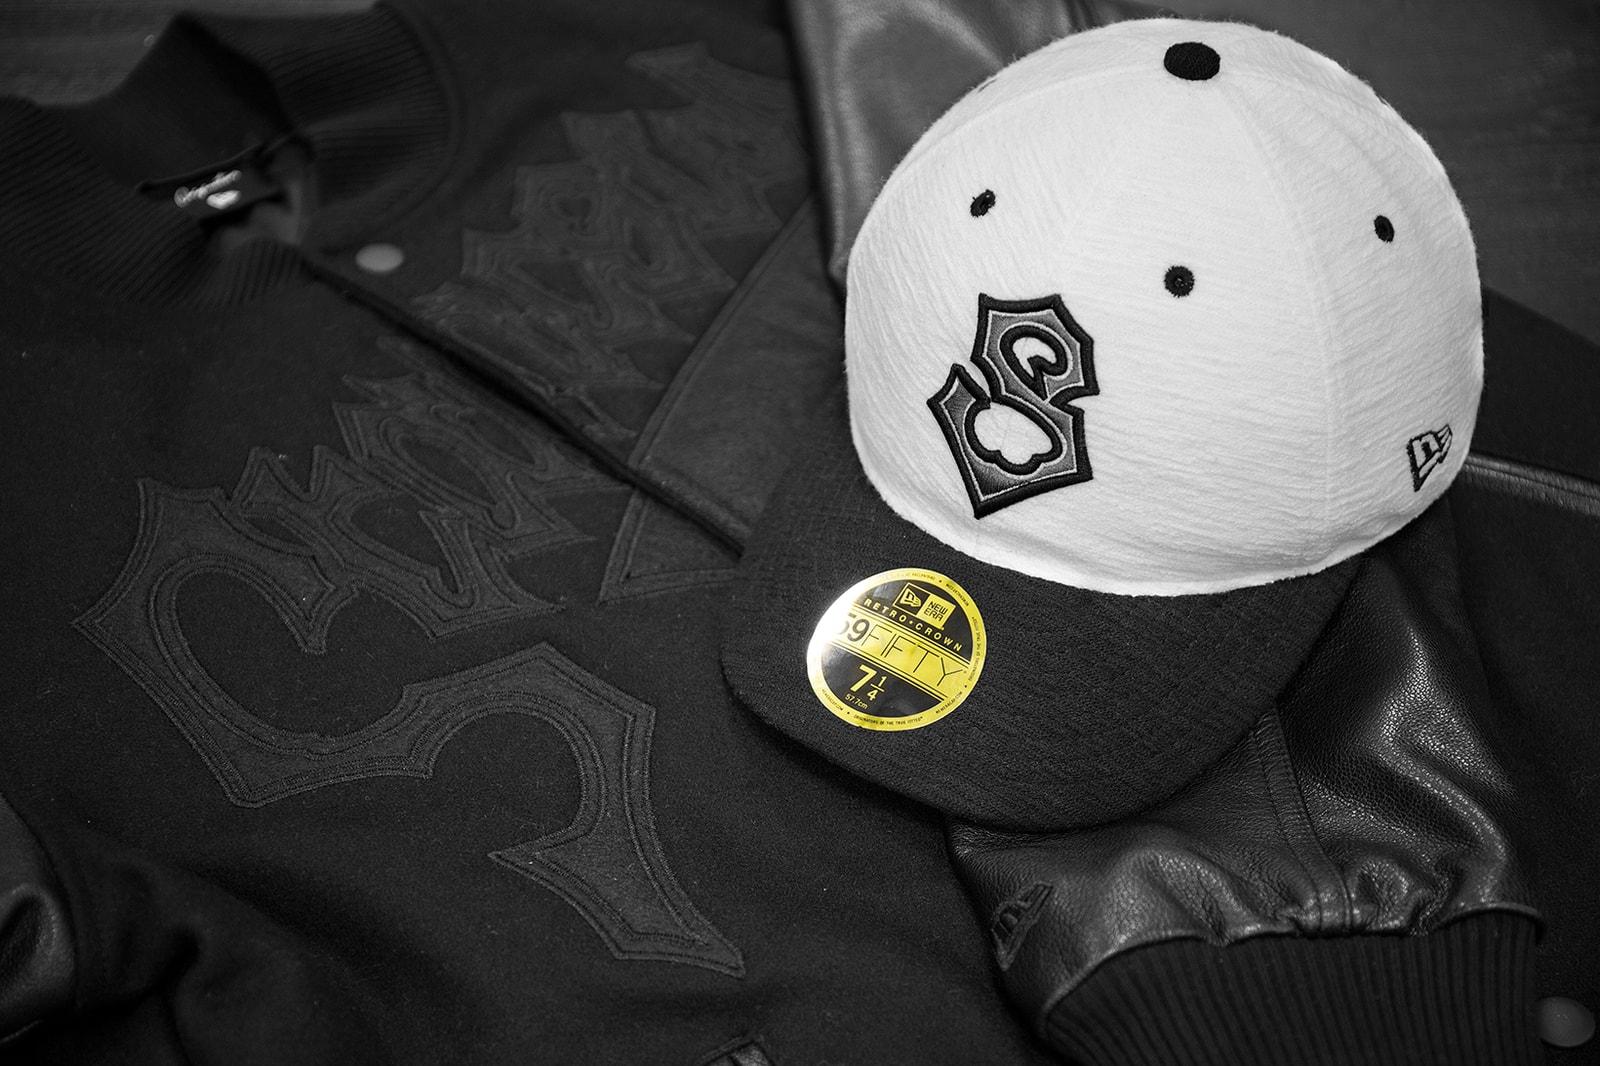 d8d411812aa91e New Era Originators Partner with Starcow Collection Exclusive Paris  Streetwear